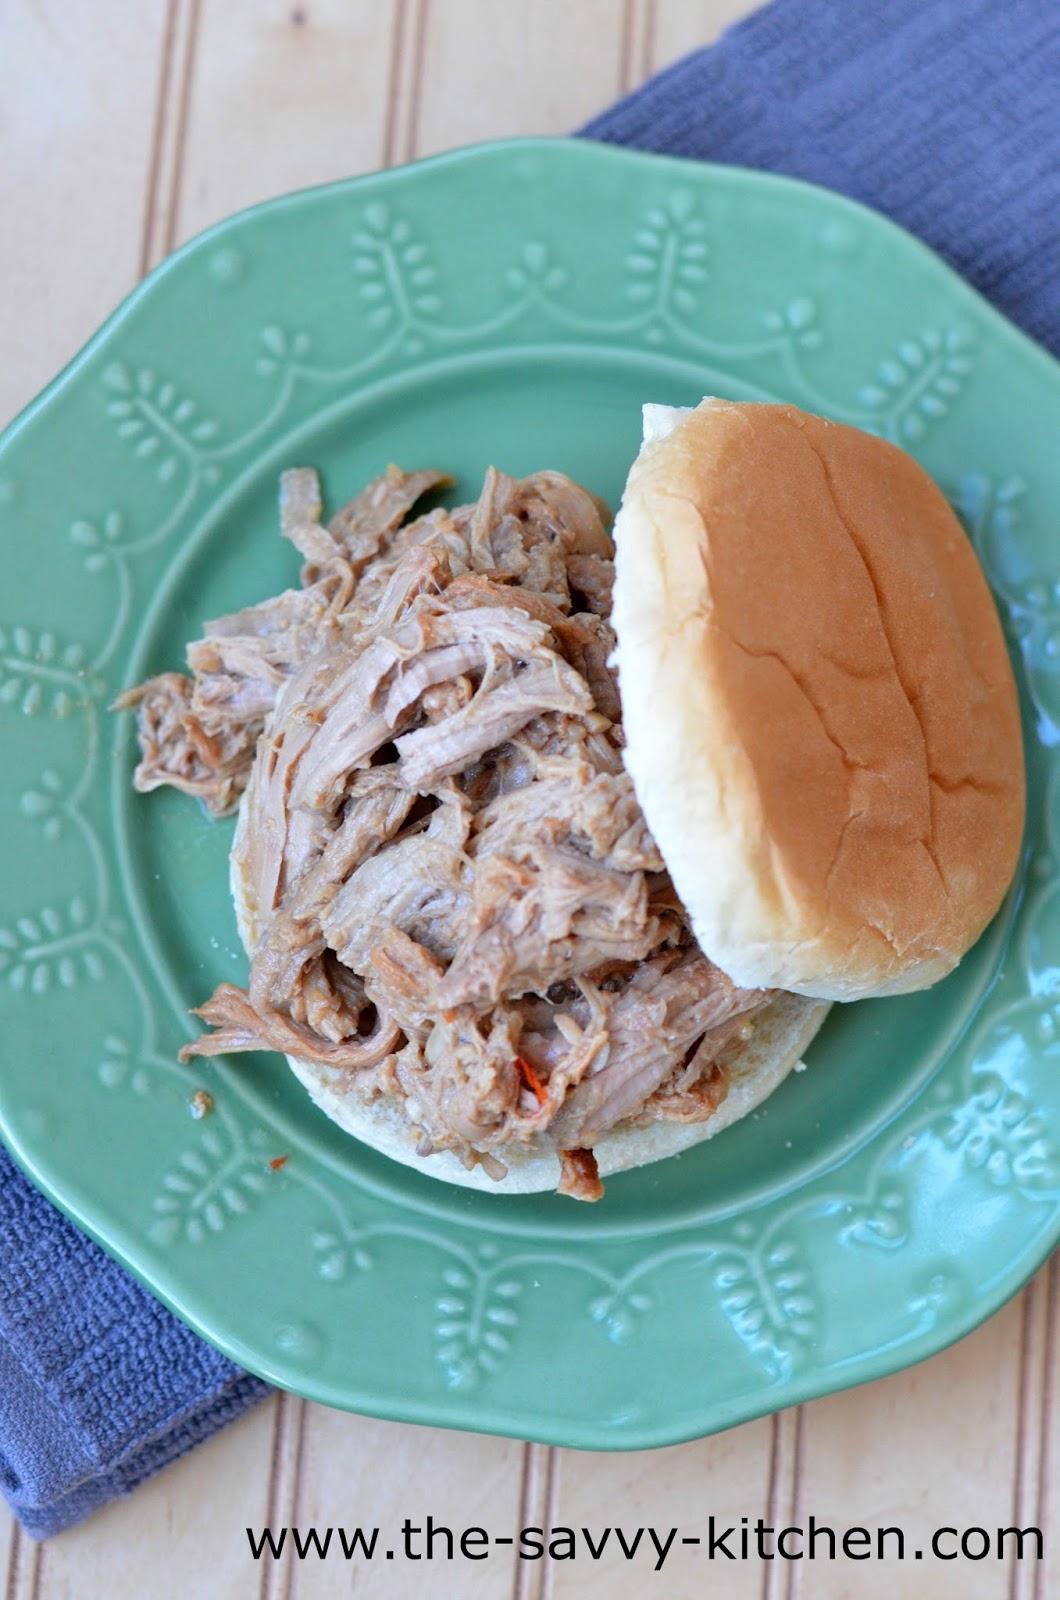 The Savvy Kitchen: Slow Cooker Hoisin Pulled Pork